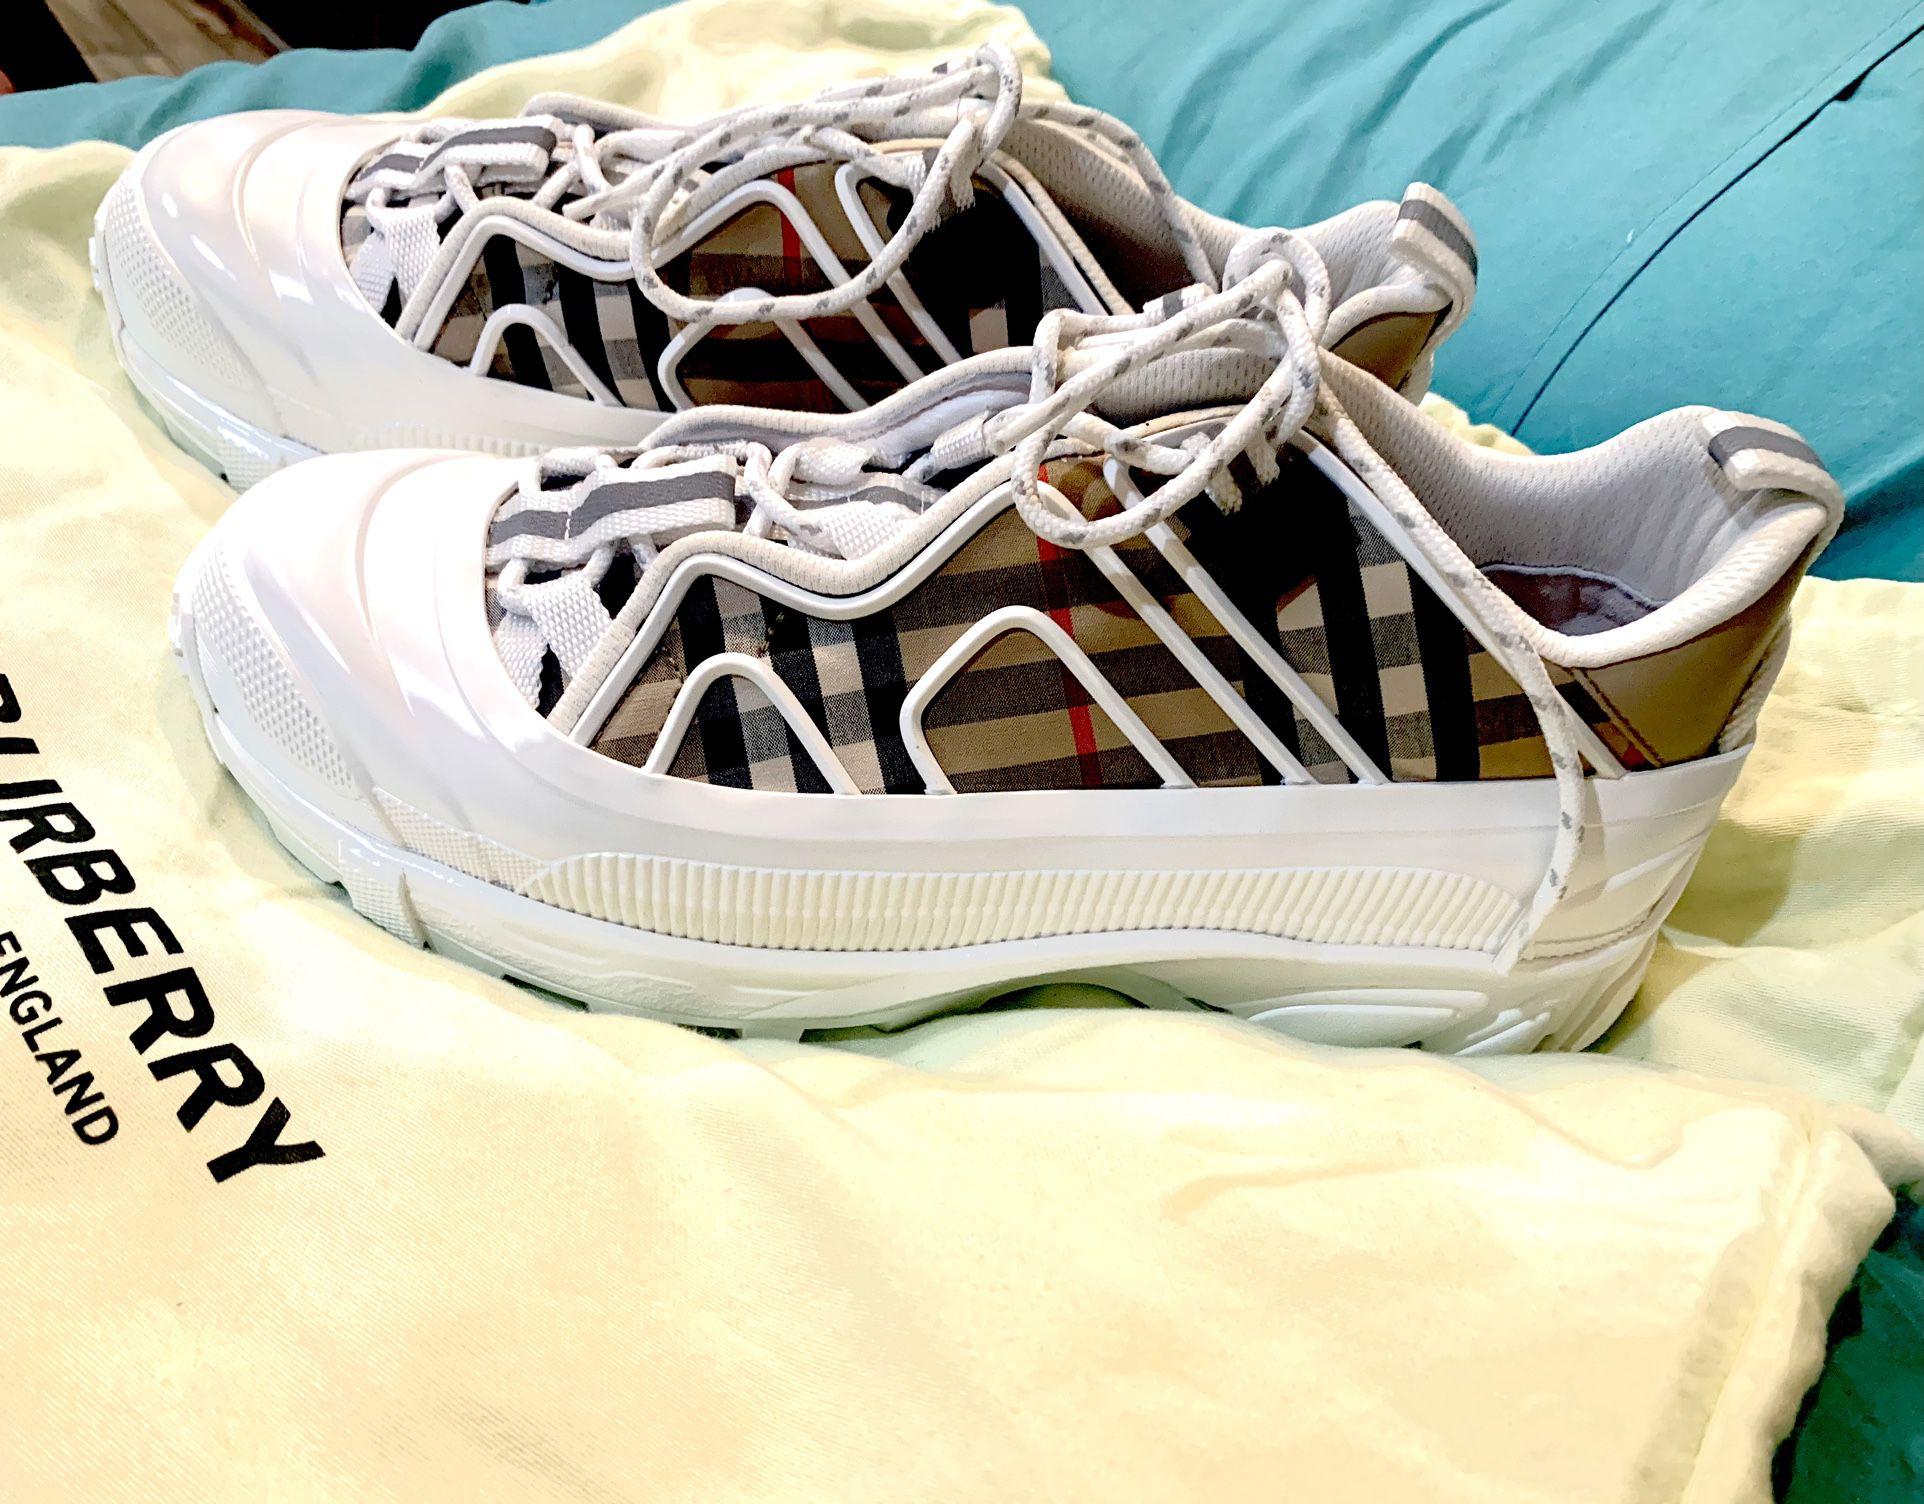 10010Burberry Arthur Check Sneakers SizeWith 7 Men's 8 1/2 Women's